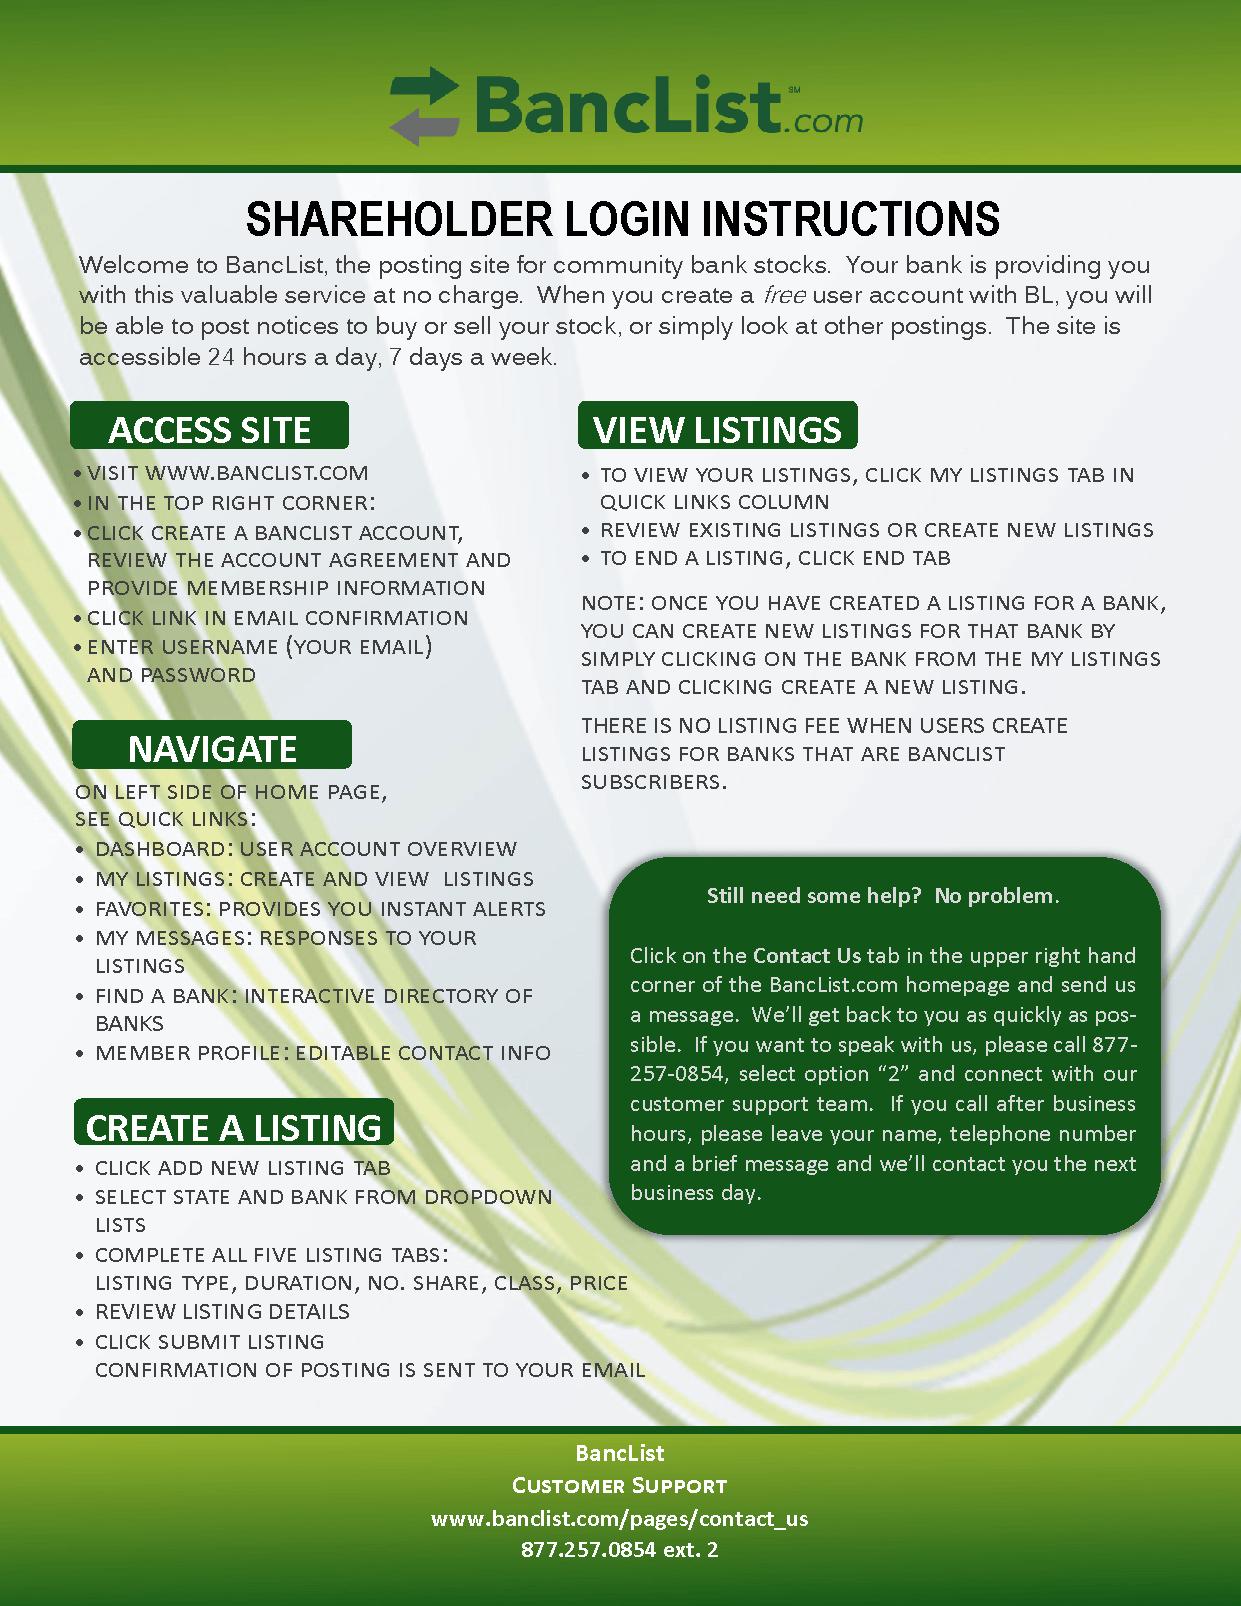 BancList Shareholder Instructions (2015)